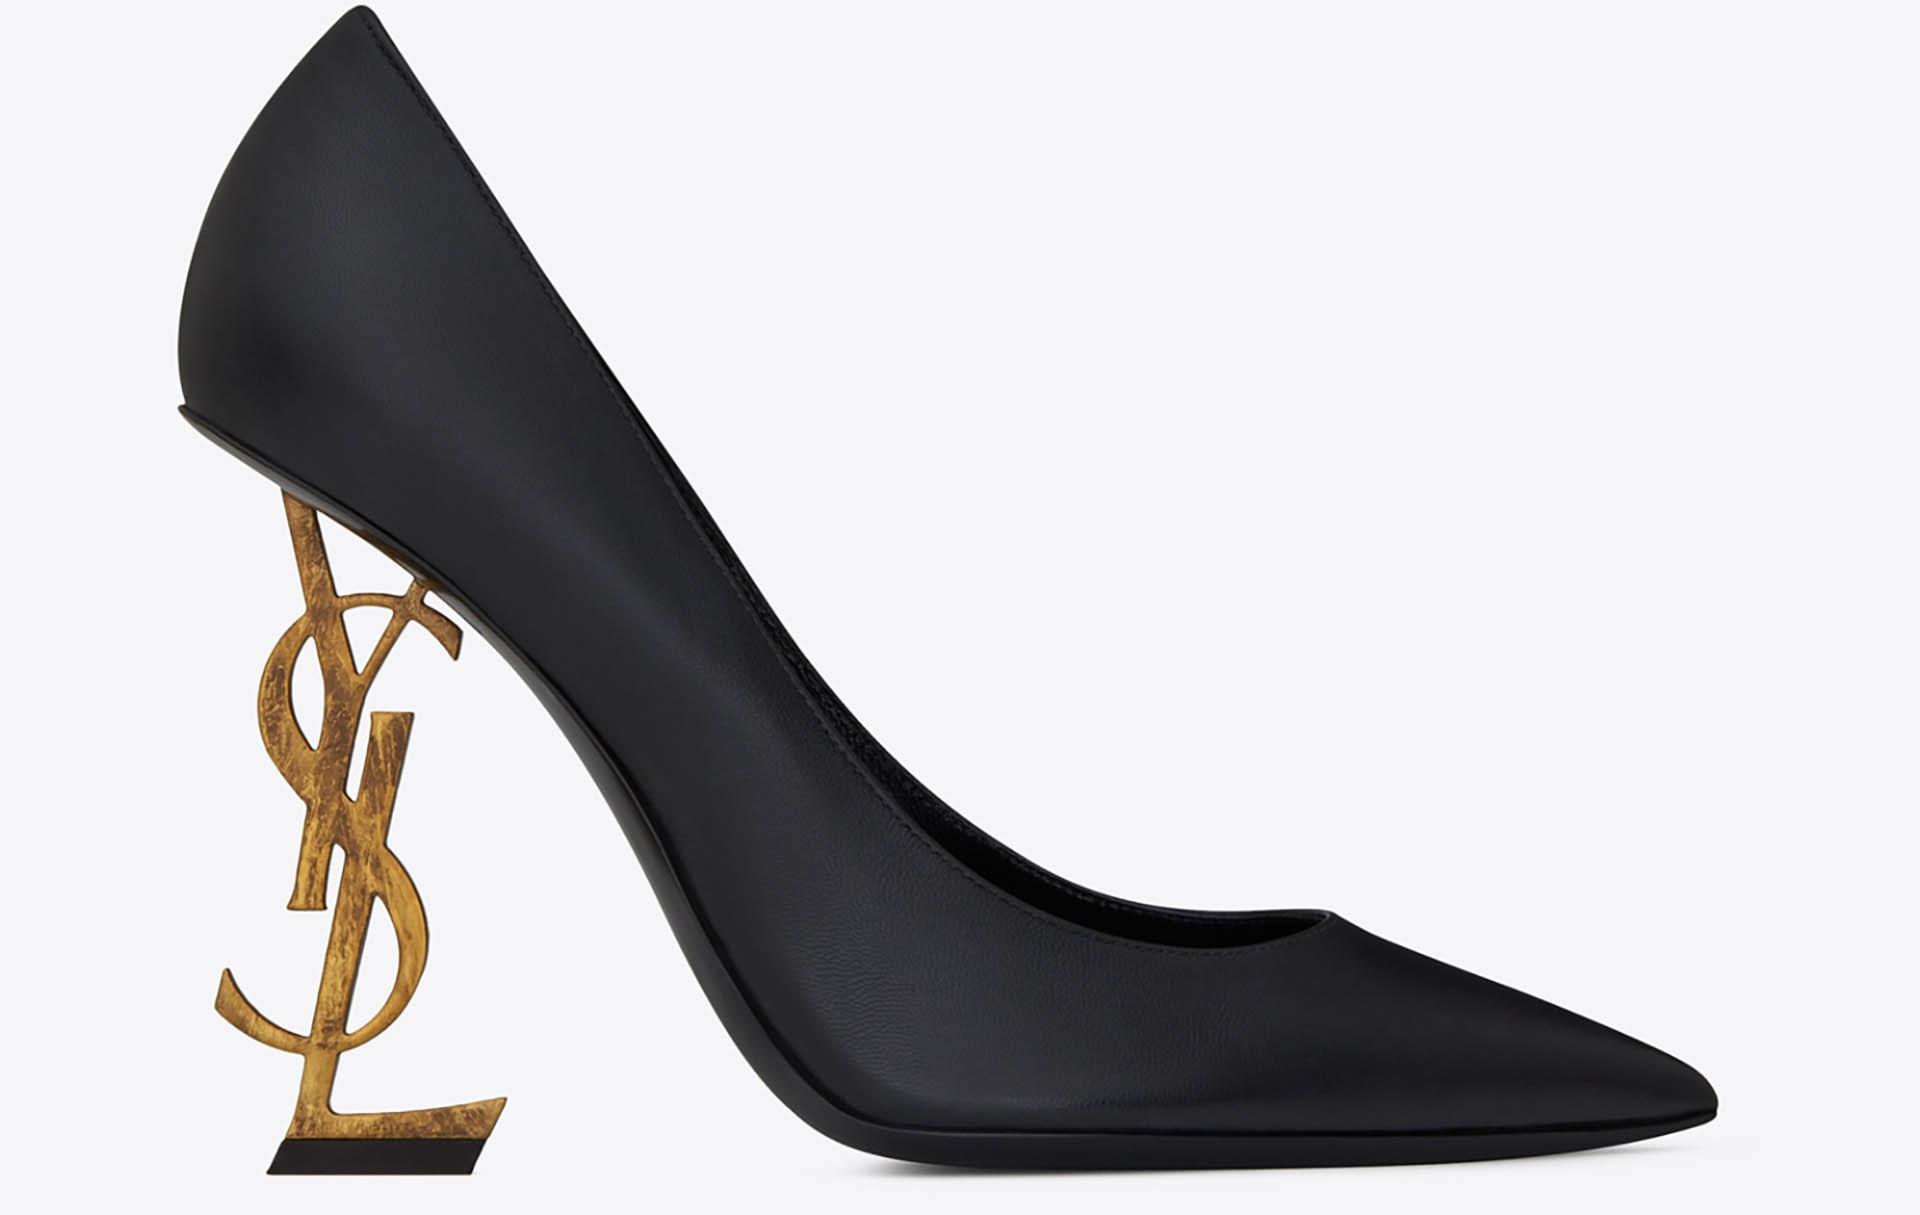 Pisan En Pasarelas Las Modelos Fuerte ZapatosLos Que rChsQdt